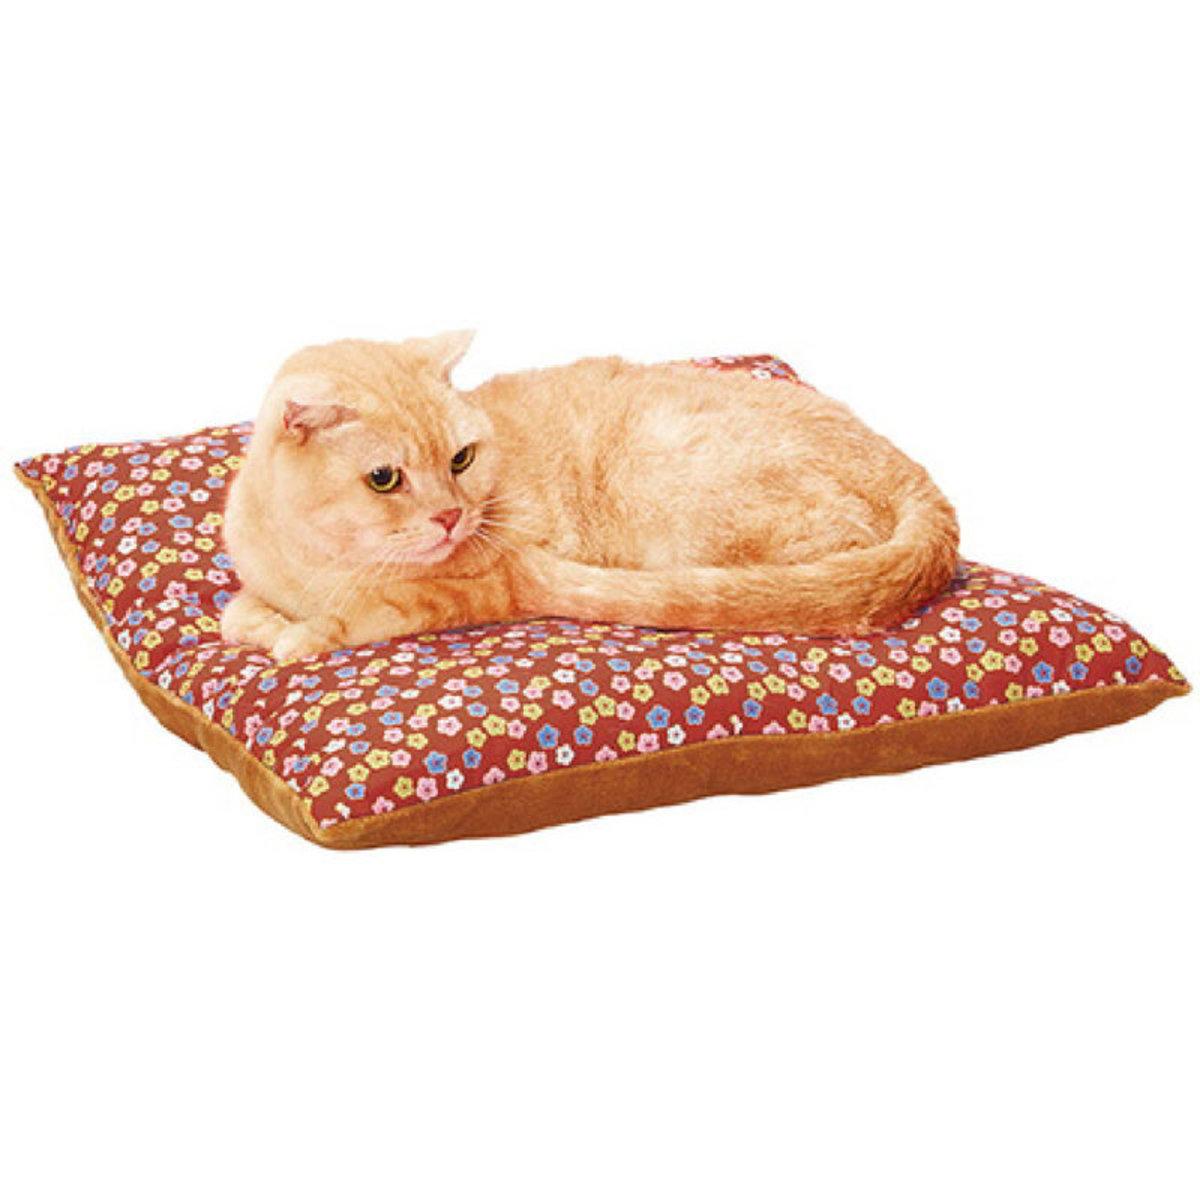 Nekokomachi Soft Sleeping Mat  Floret Pattern #H46(W25697)